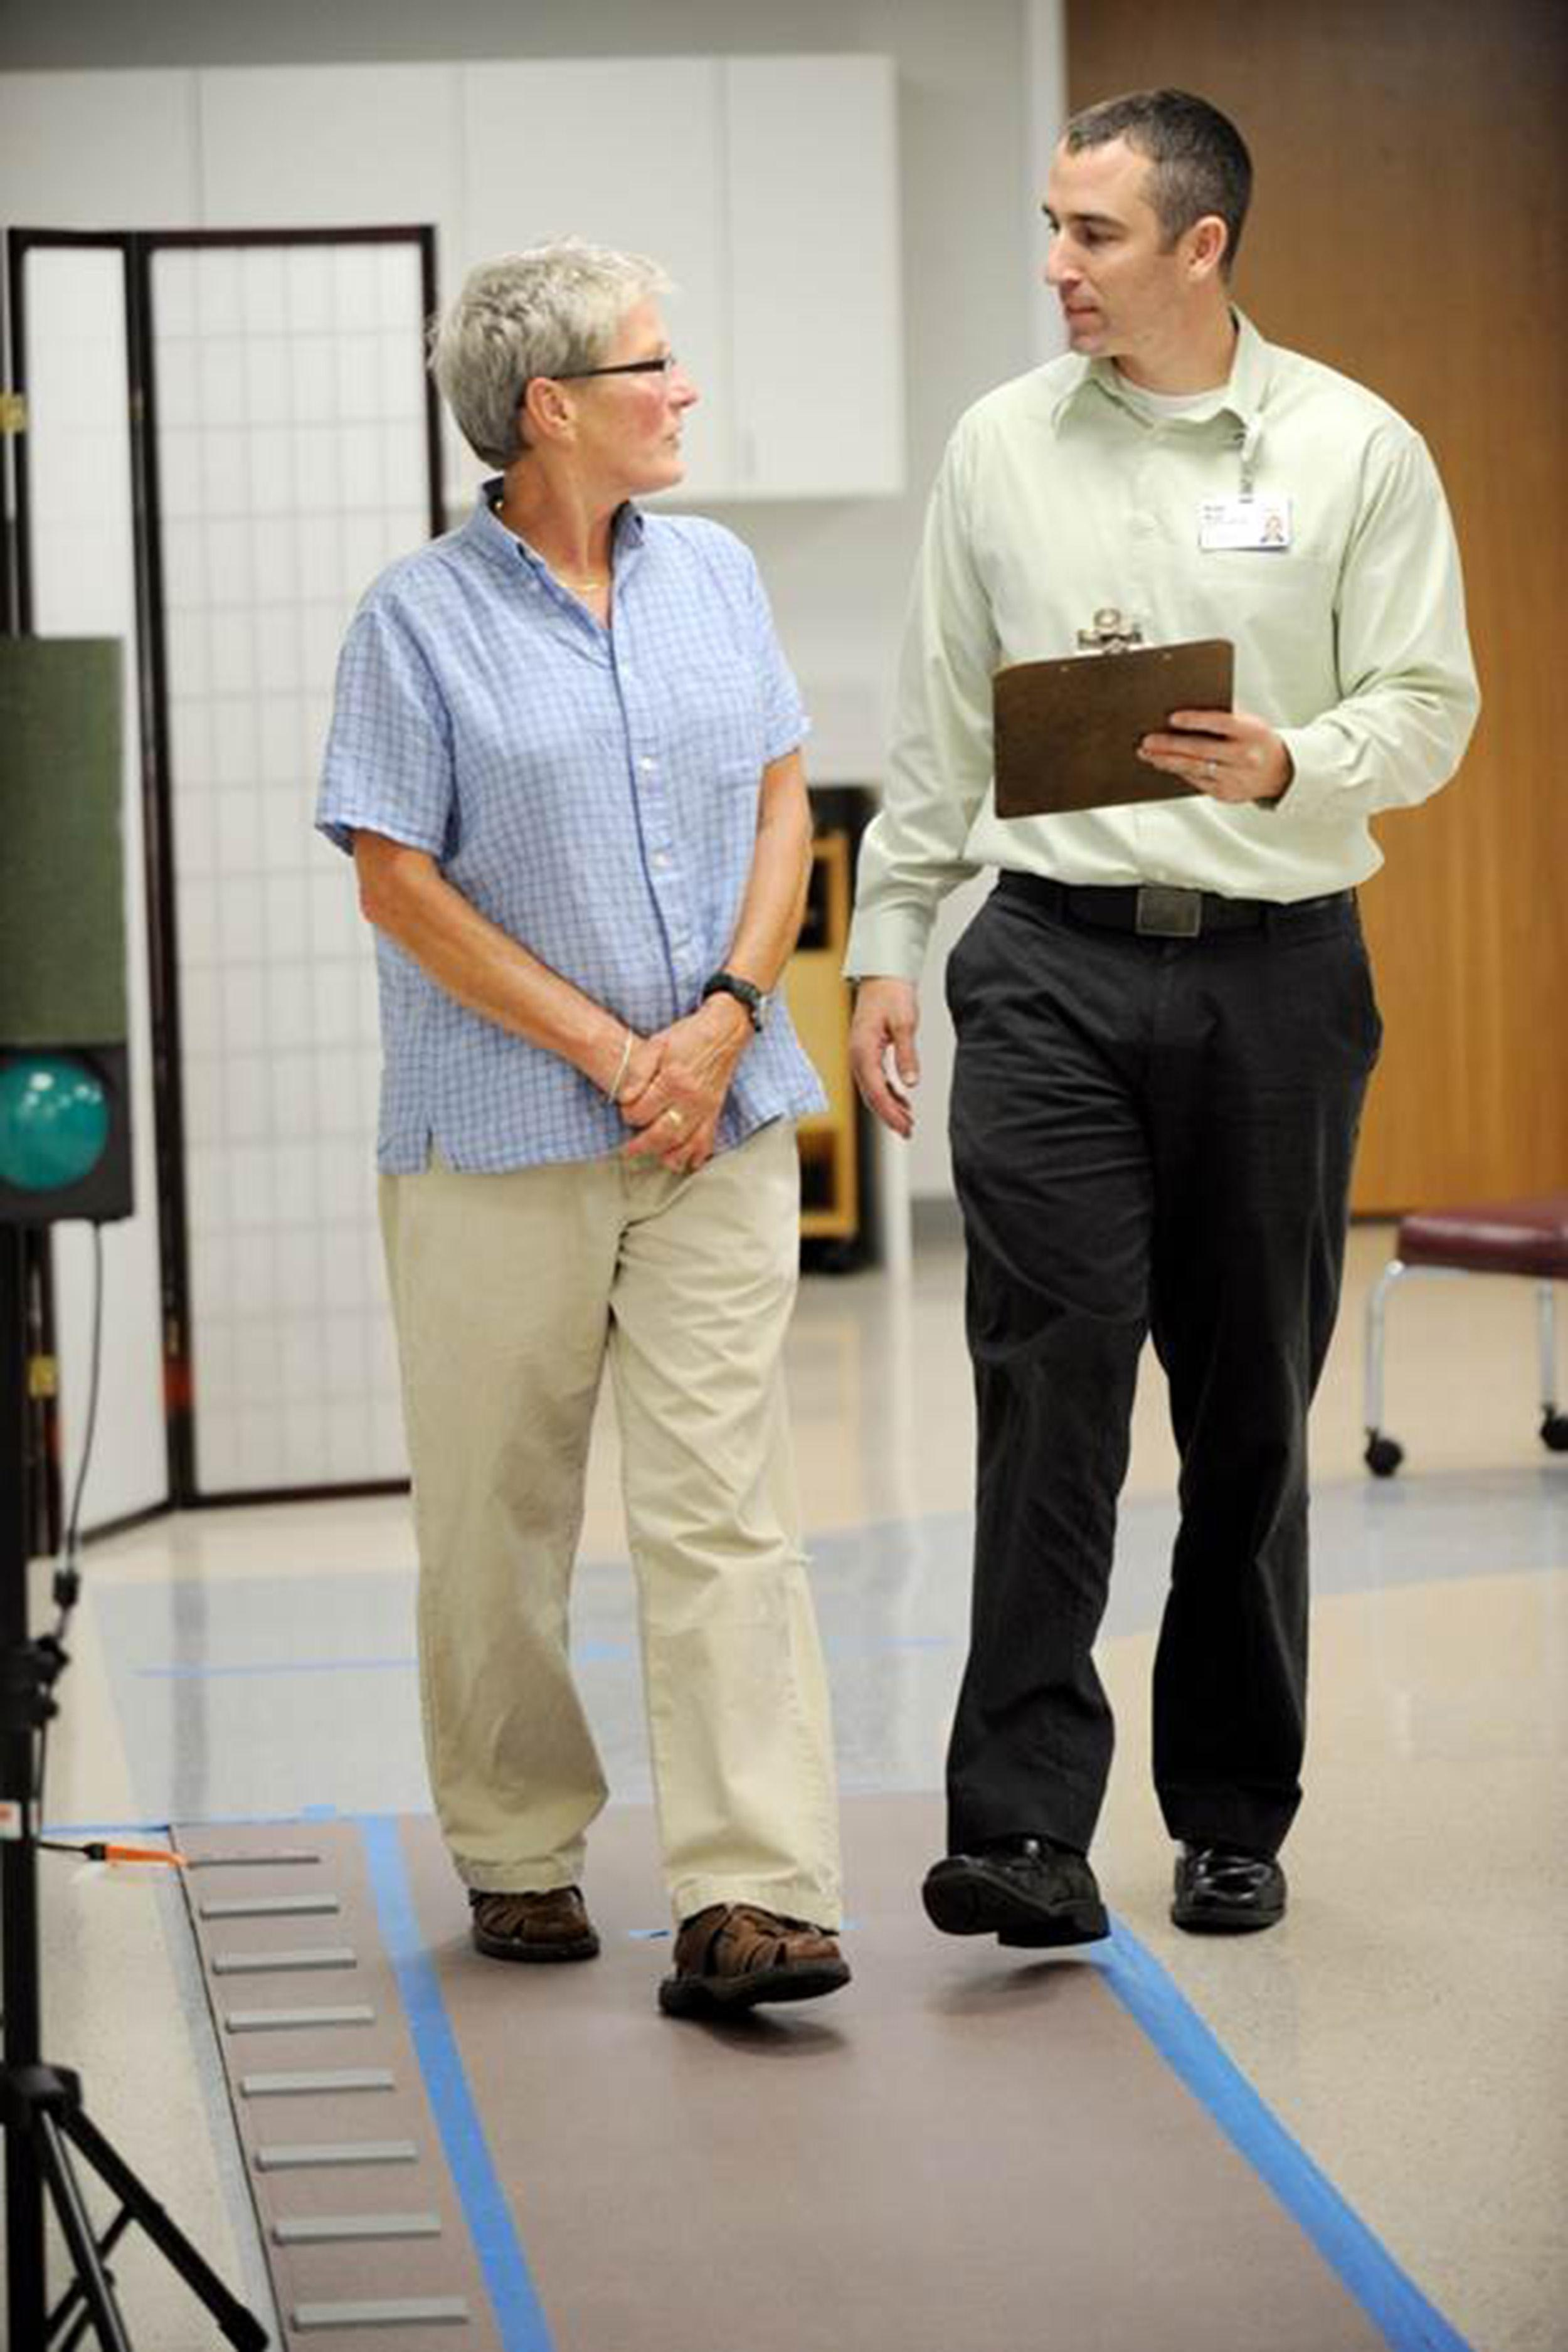 Bradley Manor, PhD performing a gait assessment